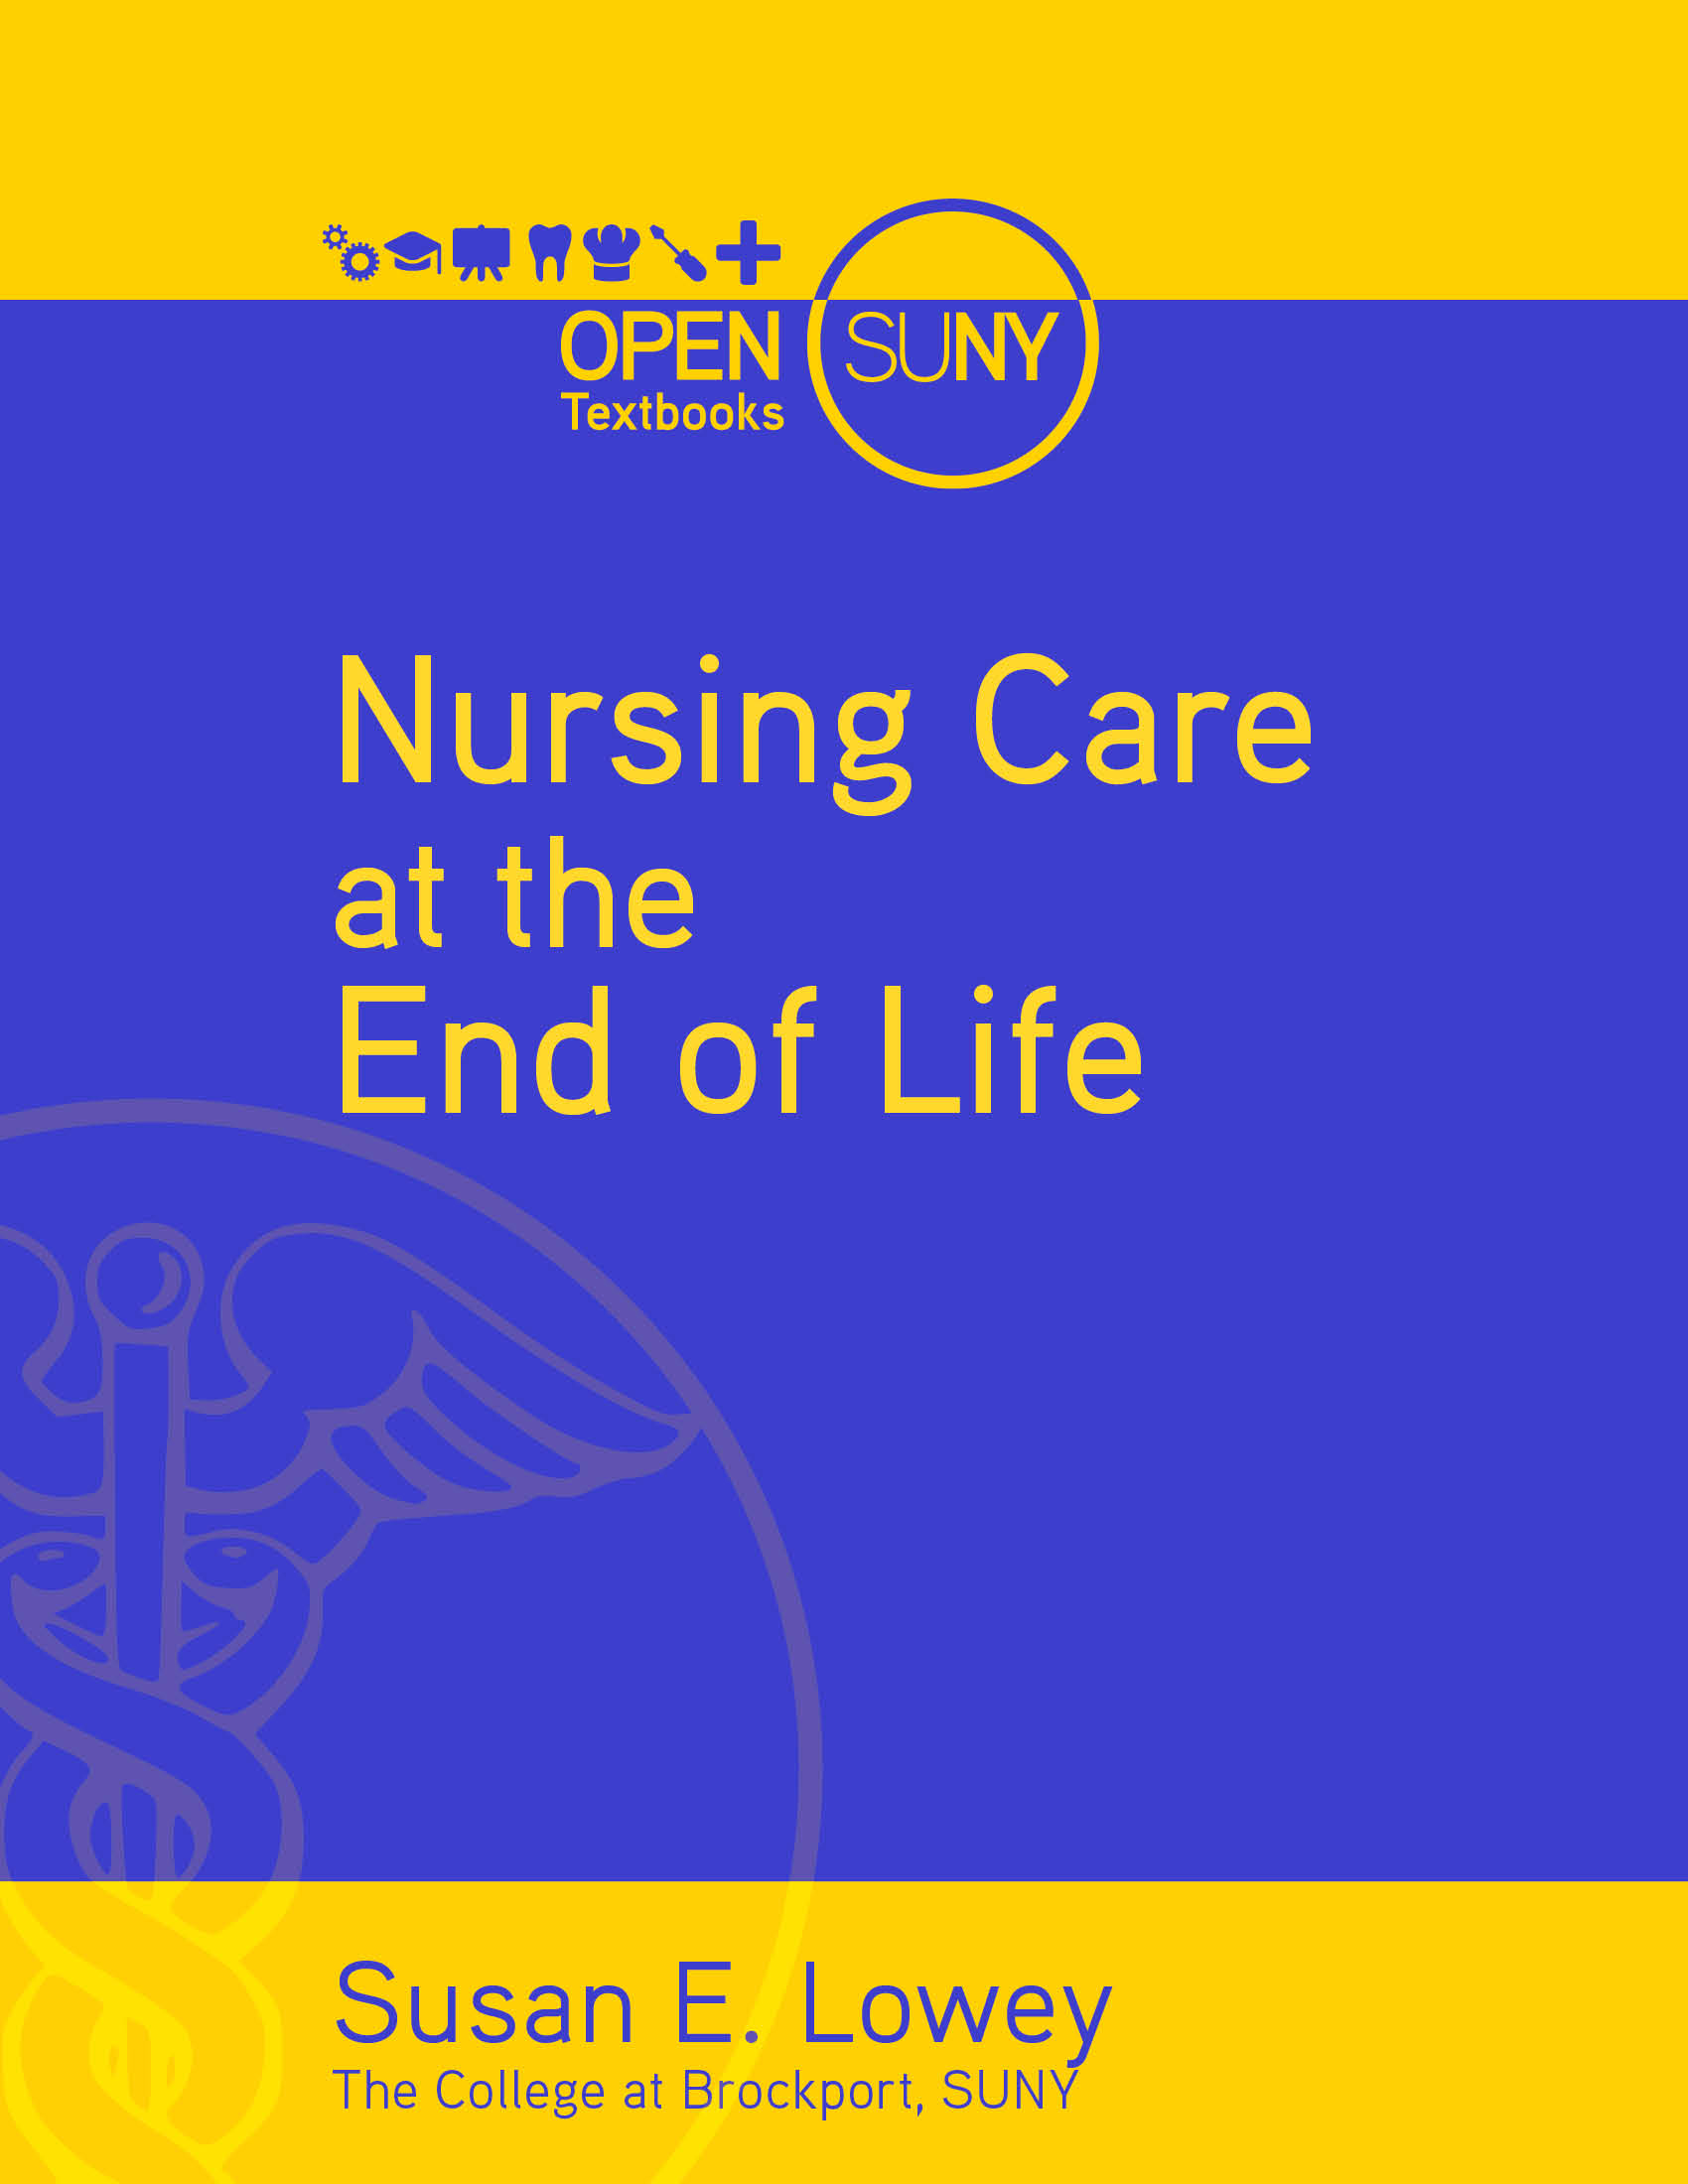 nursing care at the end of life simple book publishing. Black Bedroom Furniture Sets. Home Design Ideas